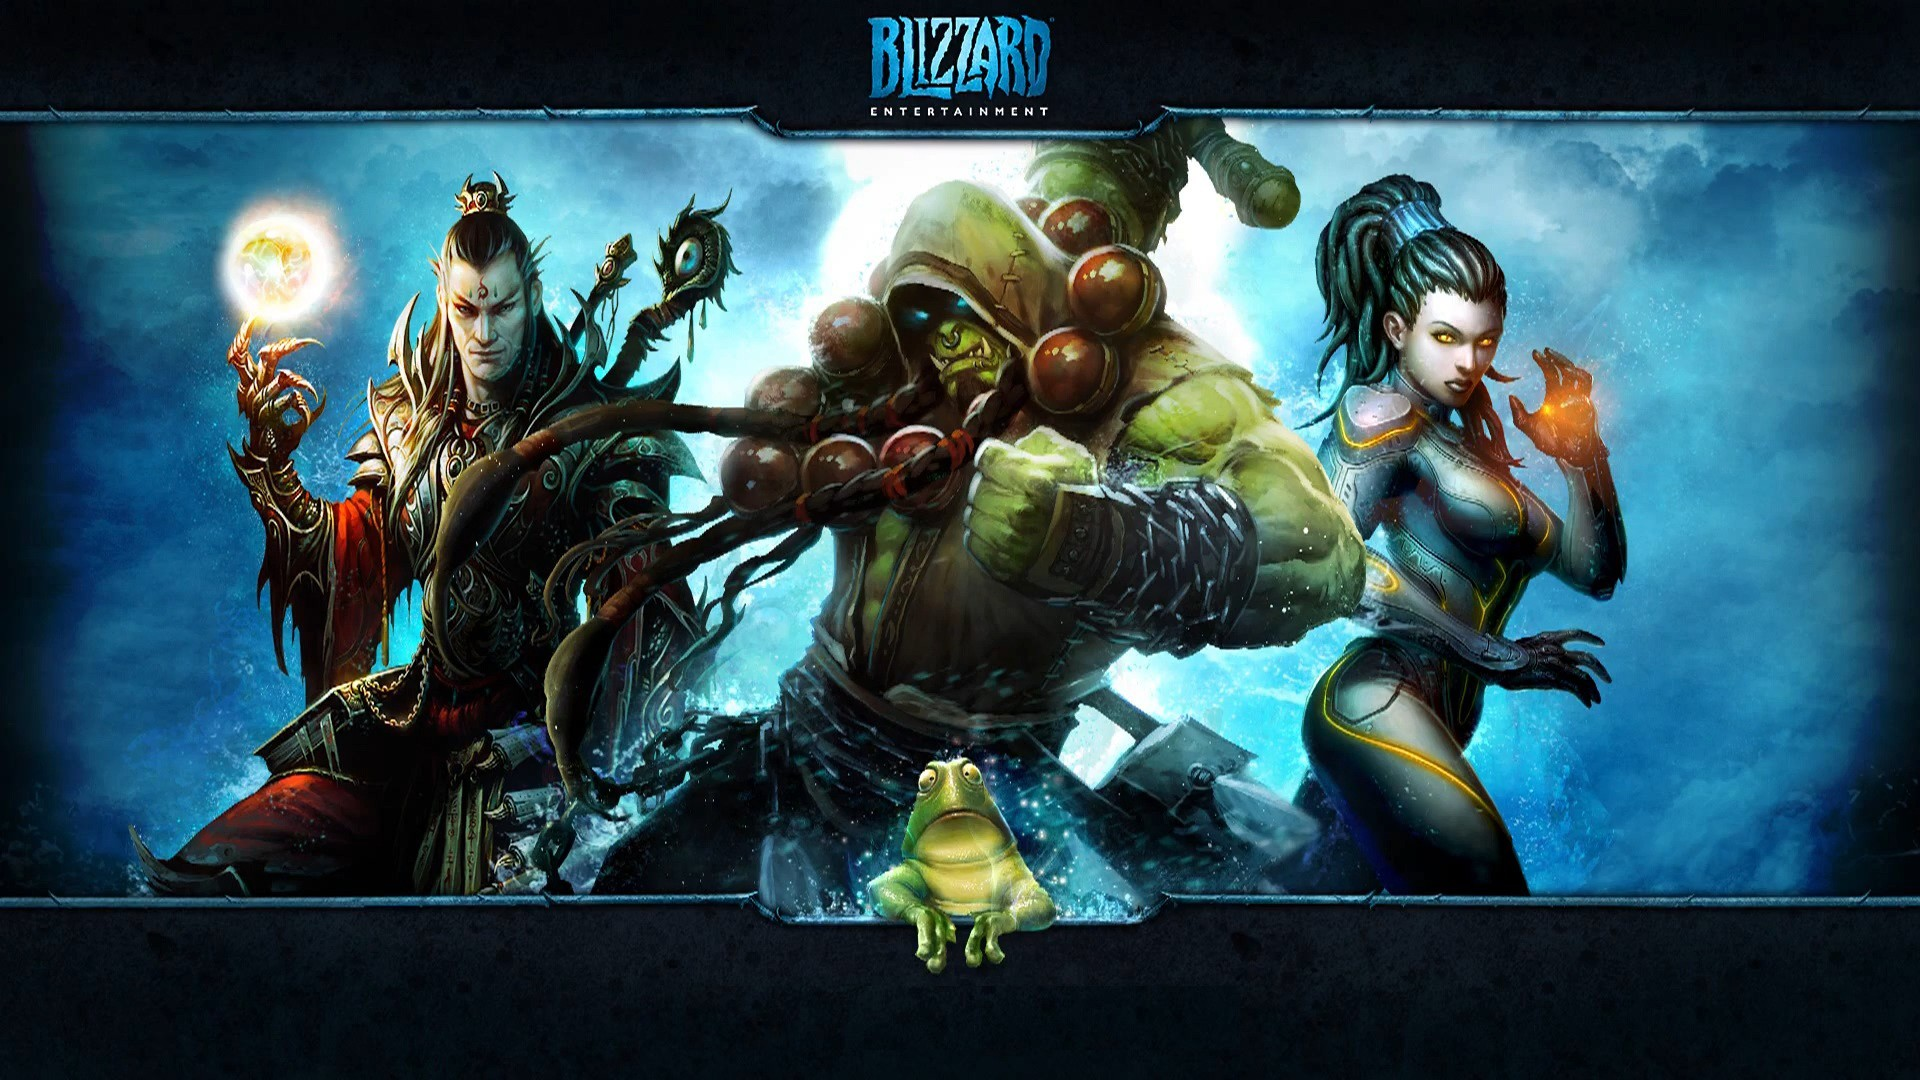 video games World of Warcraft thrall Blizzard Entertainment Diablo III 1920x1080